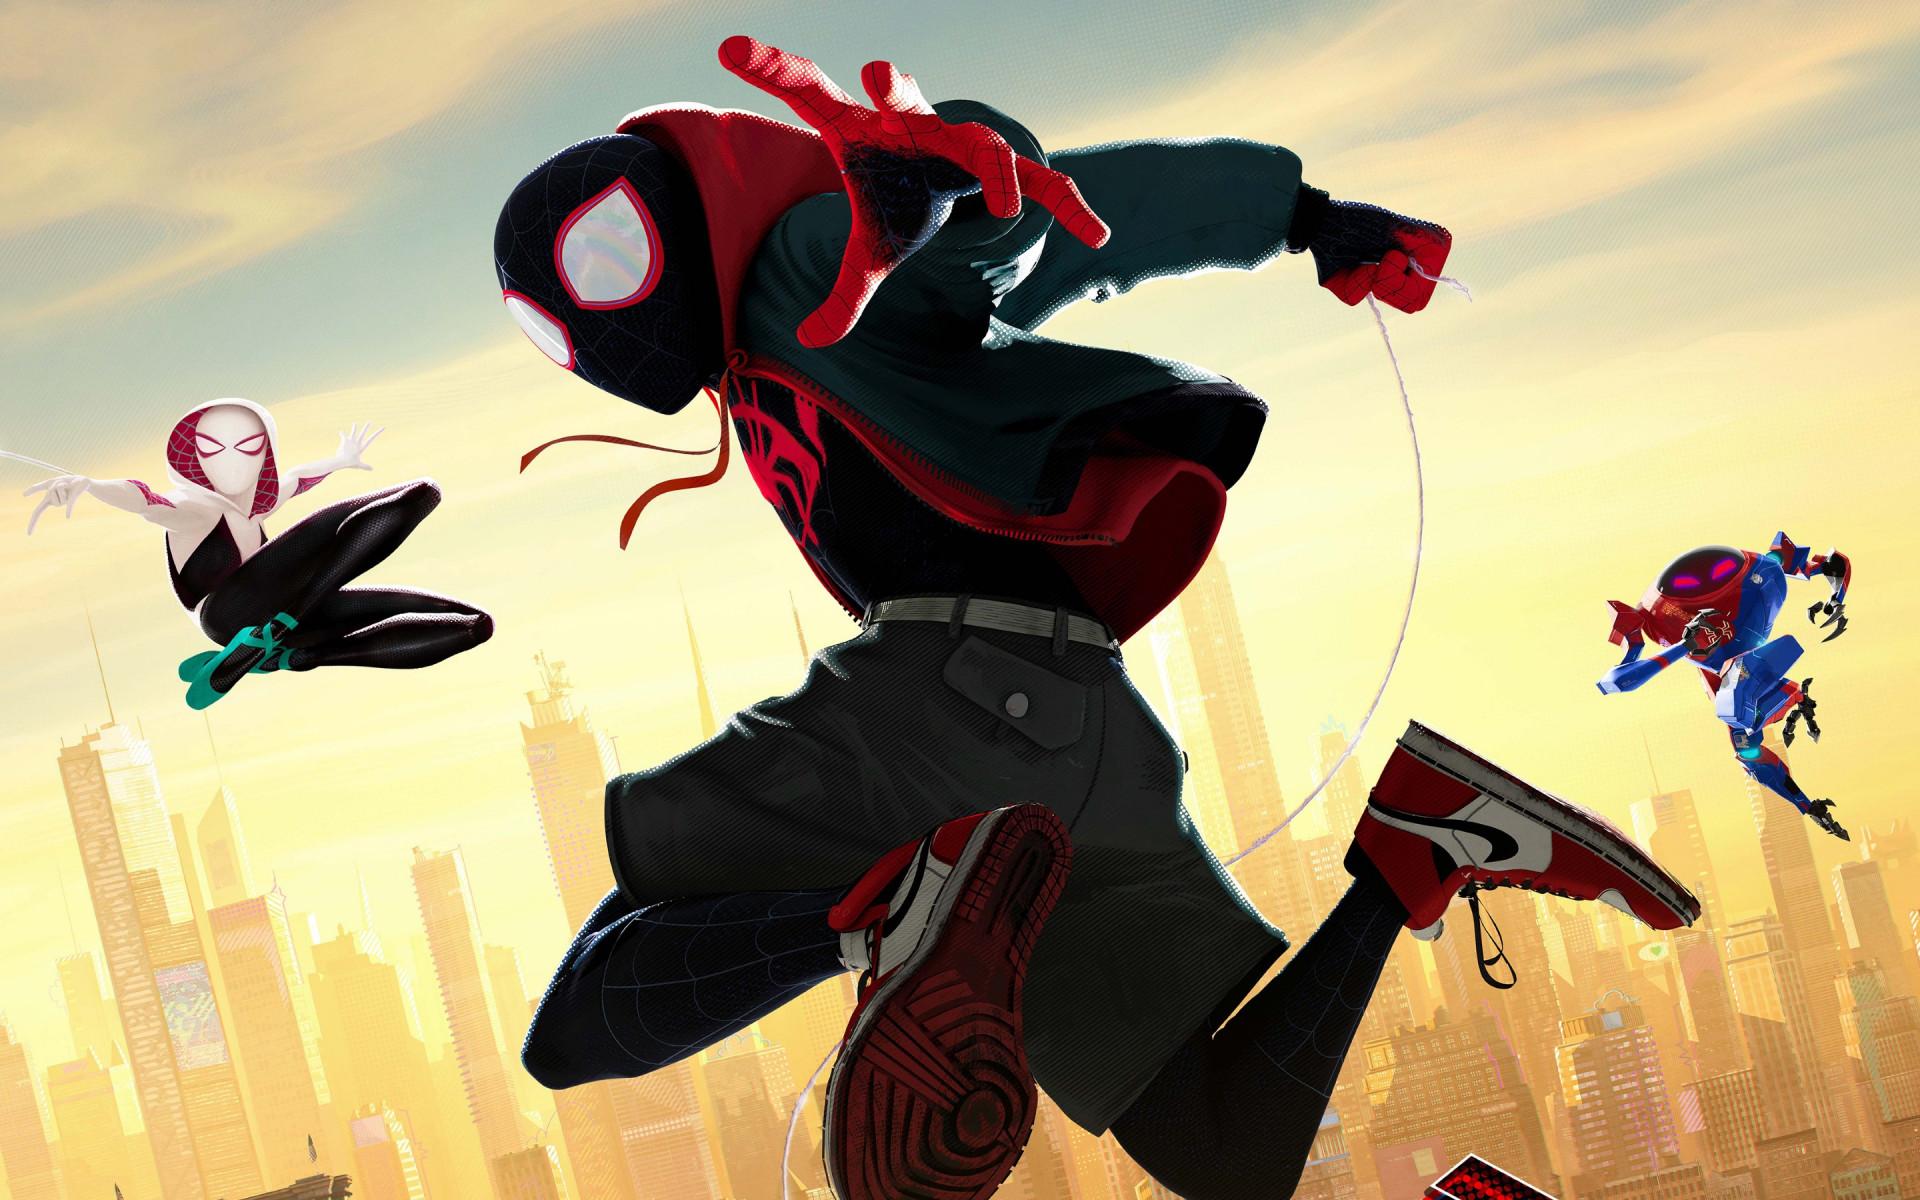 Download Wallpaper Spider Man Into The Spider Verse 1920x1200